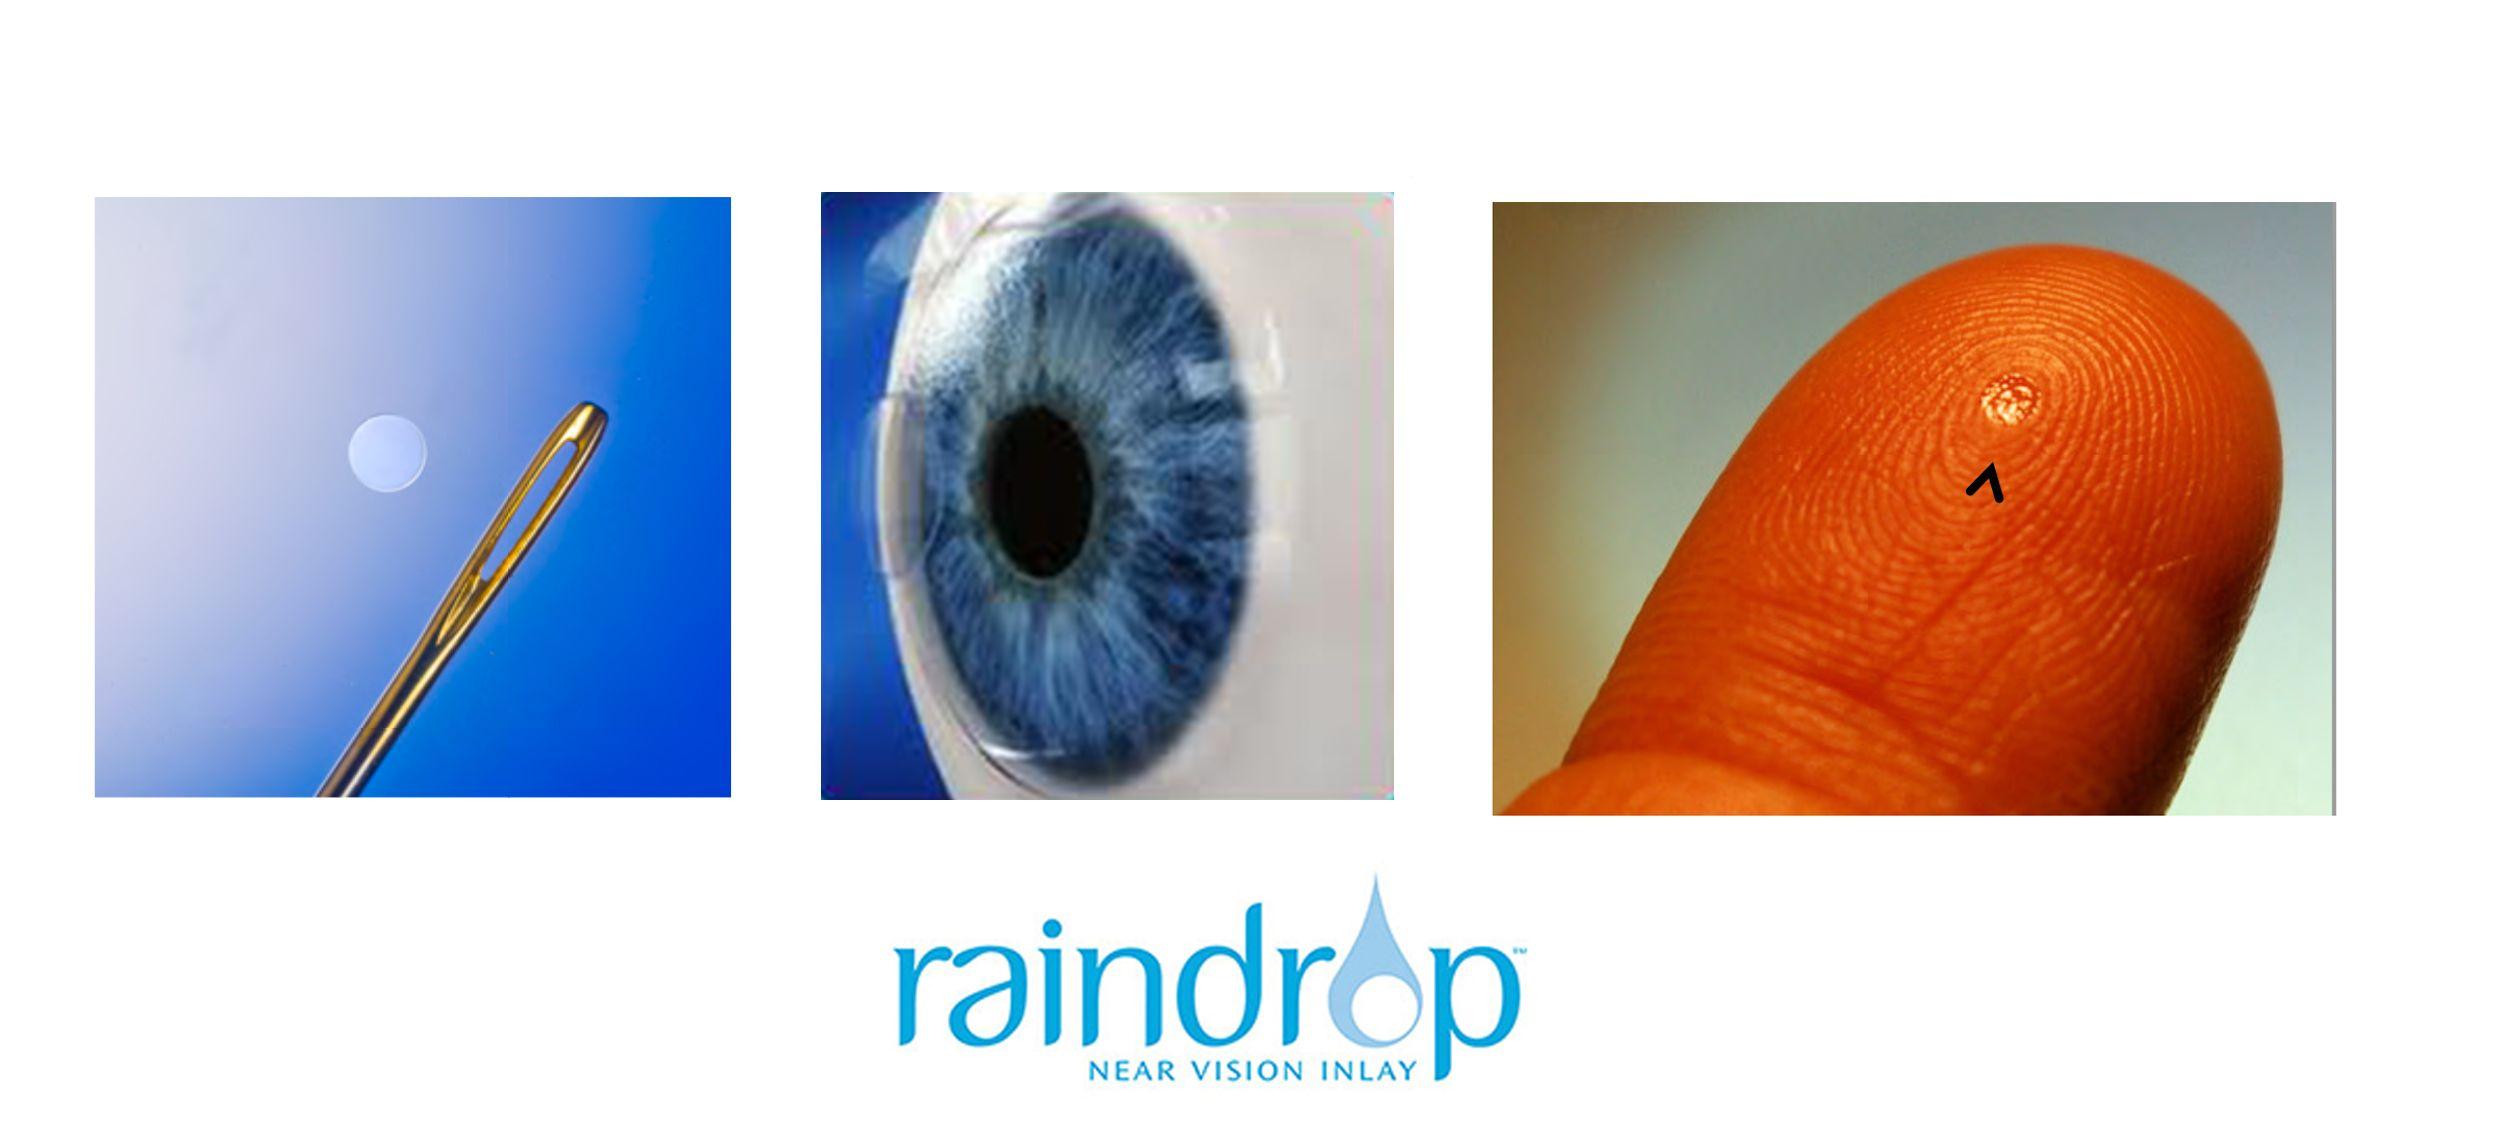 Corneal Inlay Raindrop, Revision Optics Ojos, Cirugia y